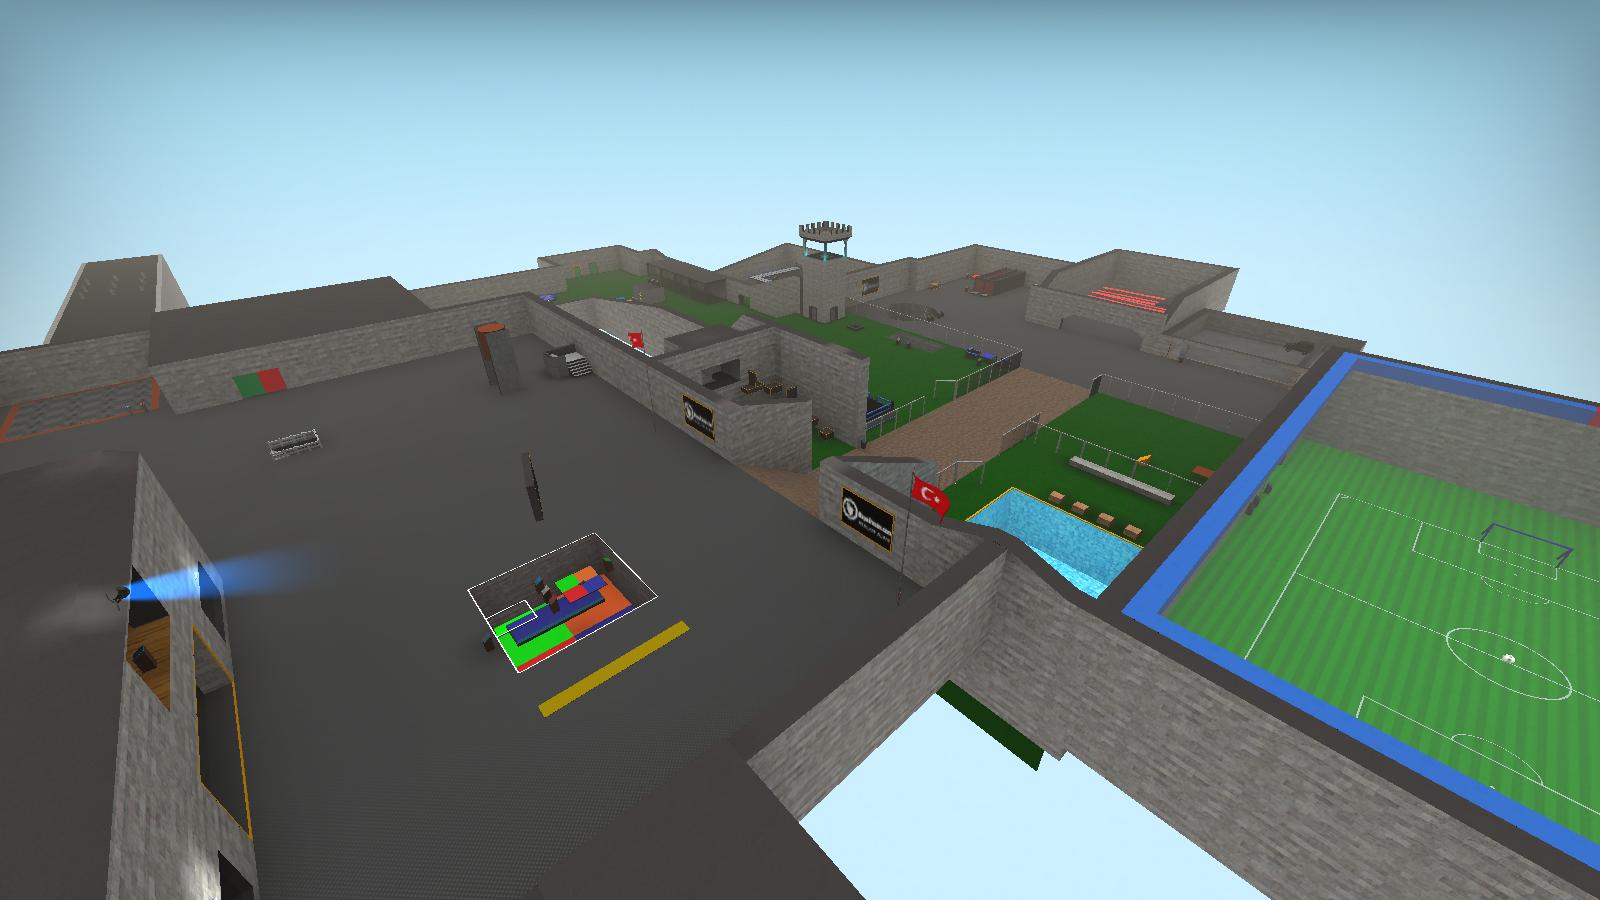 CS:GO Harita, CS:GO Haritaları, harita, CS:GO Map, CS GO map, awp, awp harita, awp edit, awp lego edit, awp map, map, satış, plugincim, cs:go maps, awp_lego_2, awp_lego_2 edit, haritalar, cs go mapleri, cs:go maps